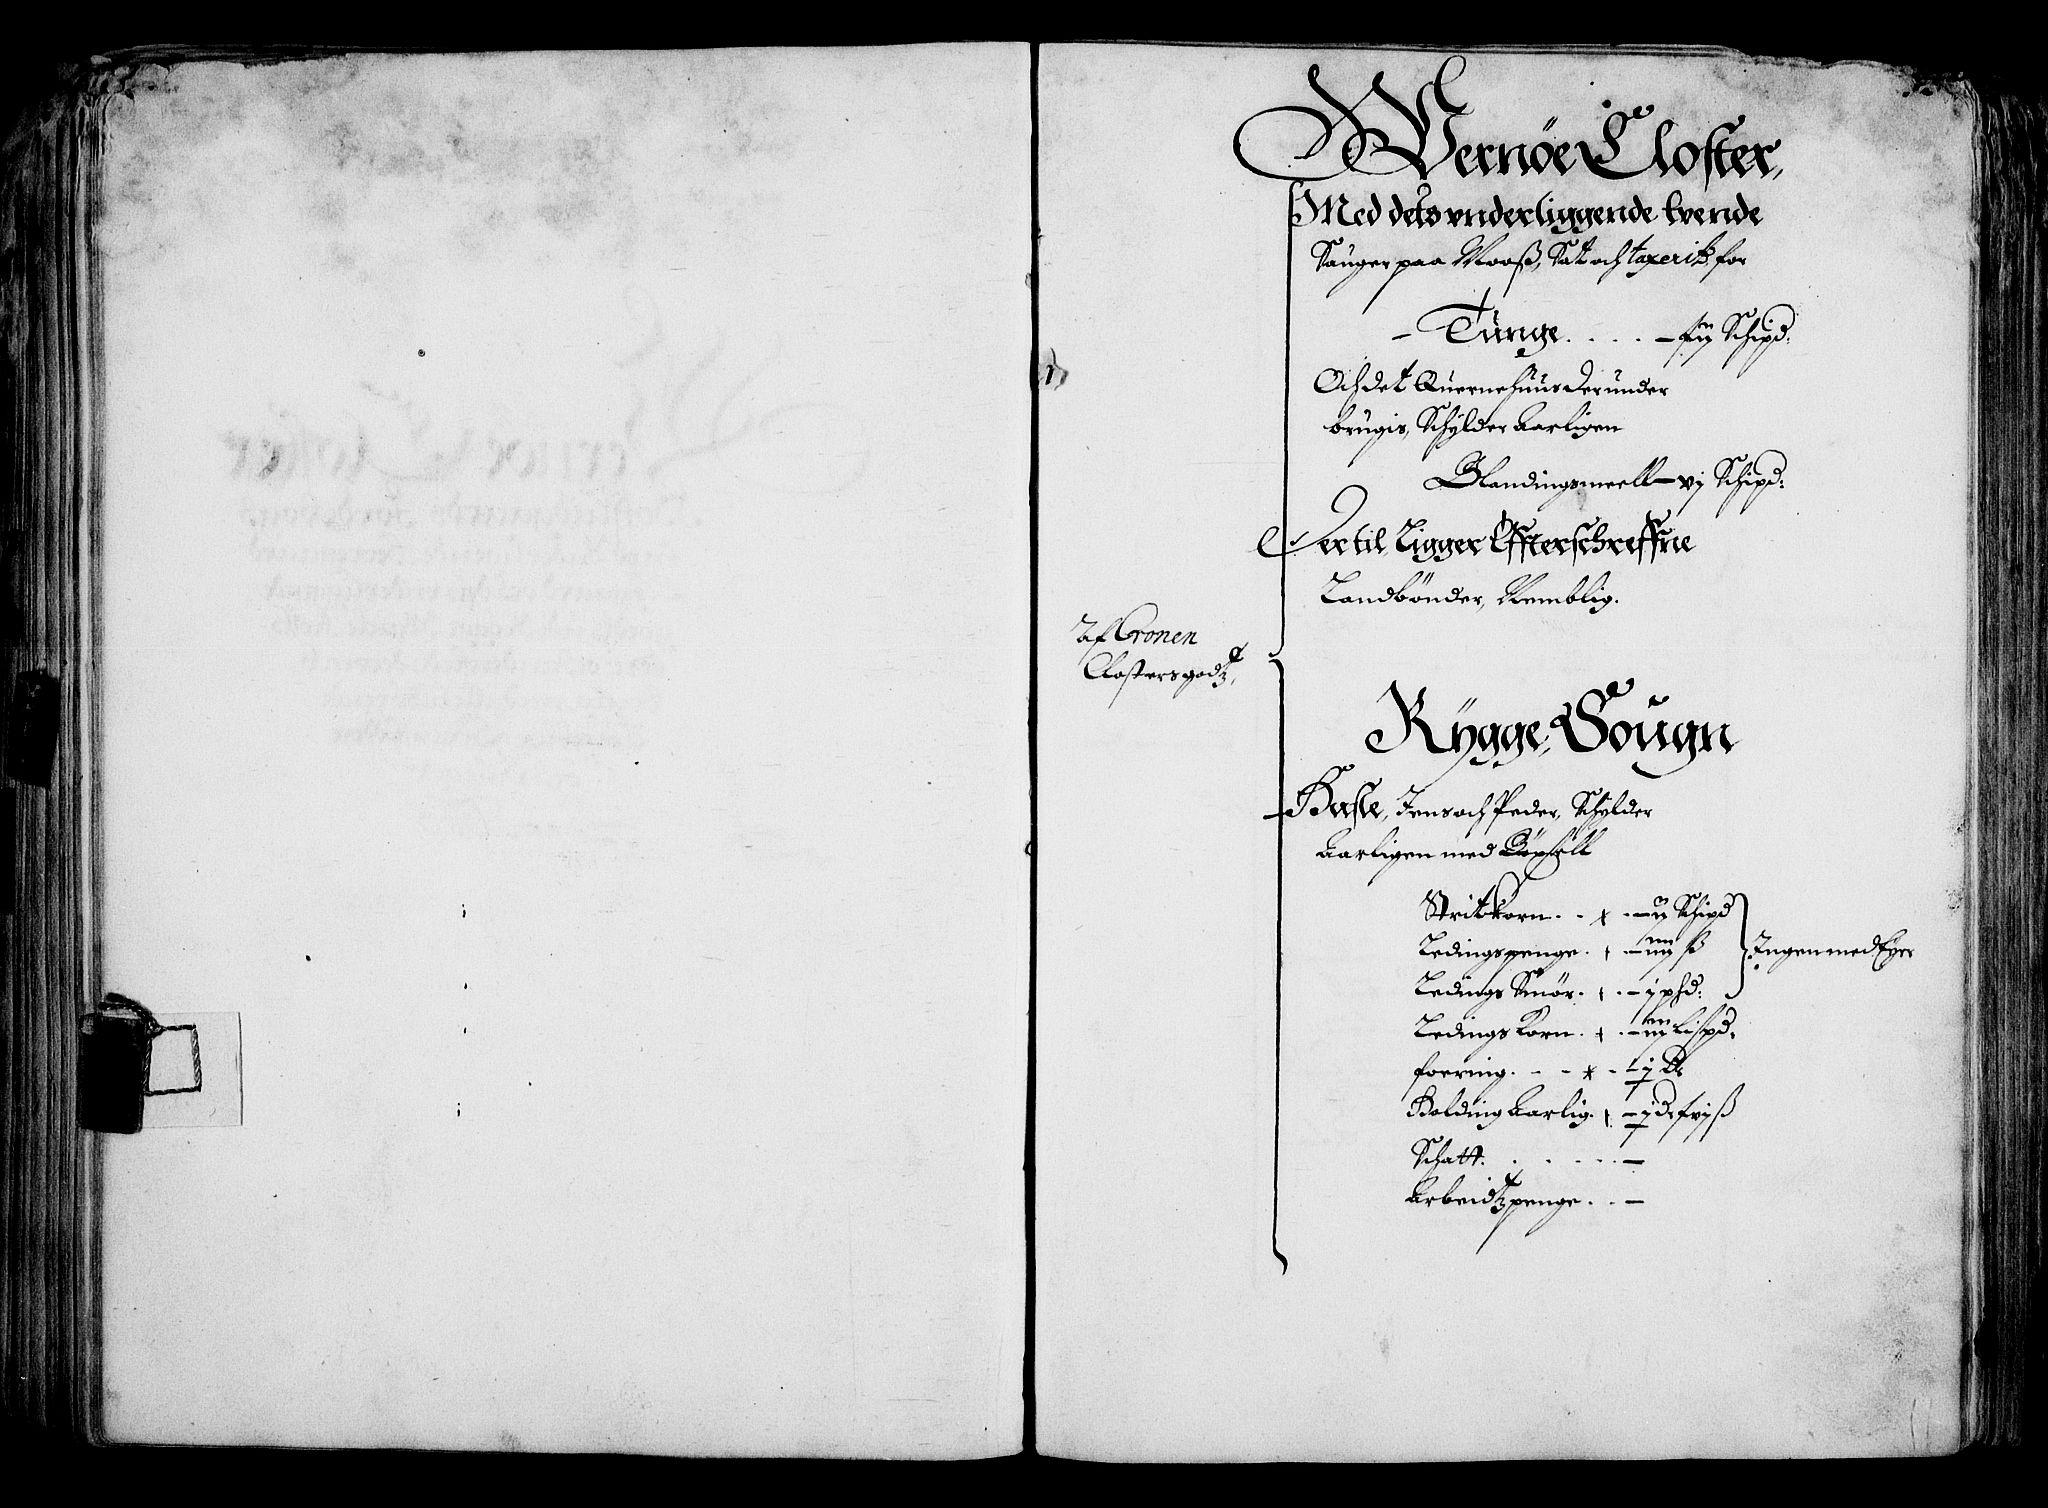 RA, Rentekammeret inntil 1814, Realistisk ordnet avdeling, On/L0001: Statens gods, 1651, s. 128